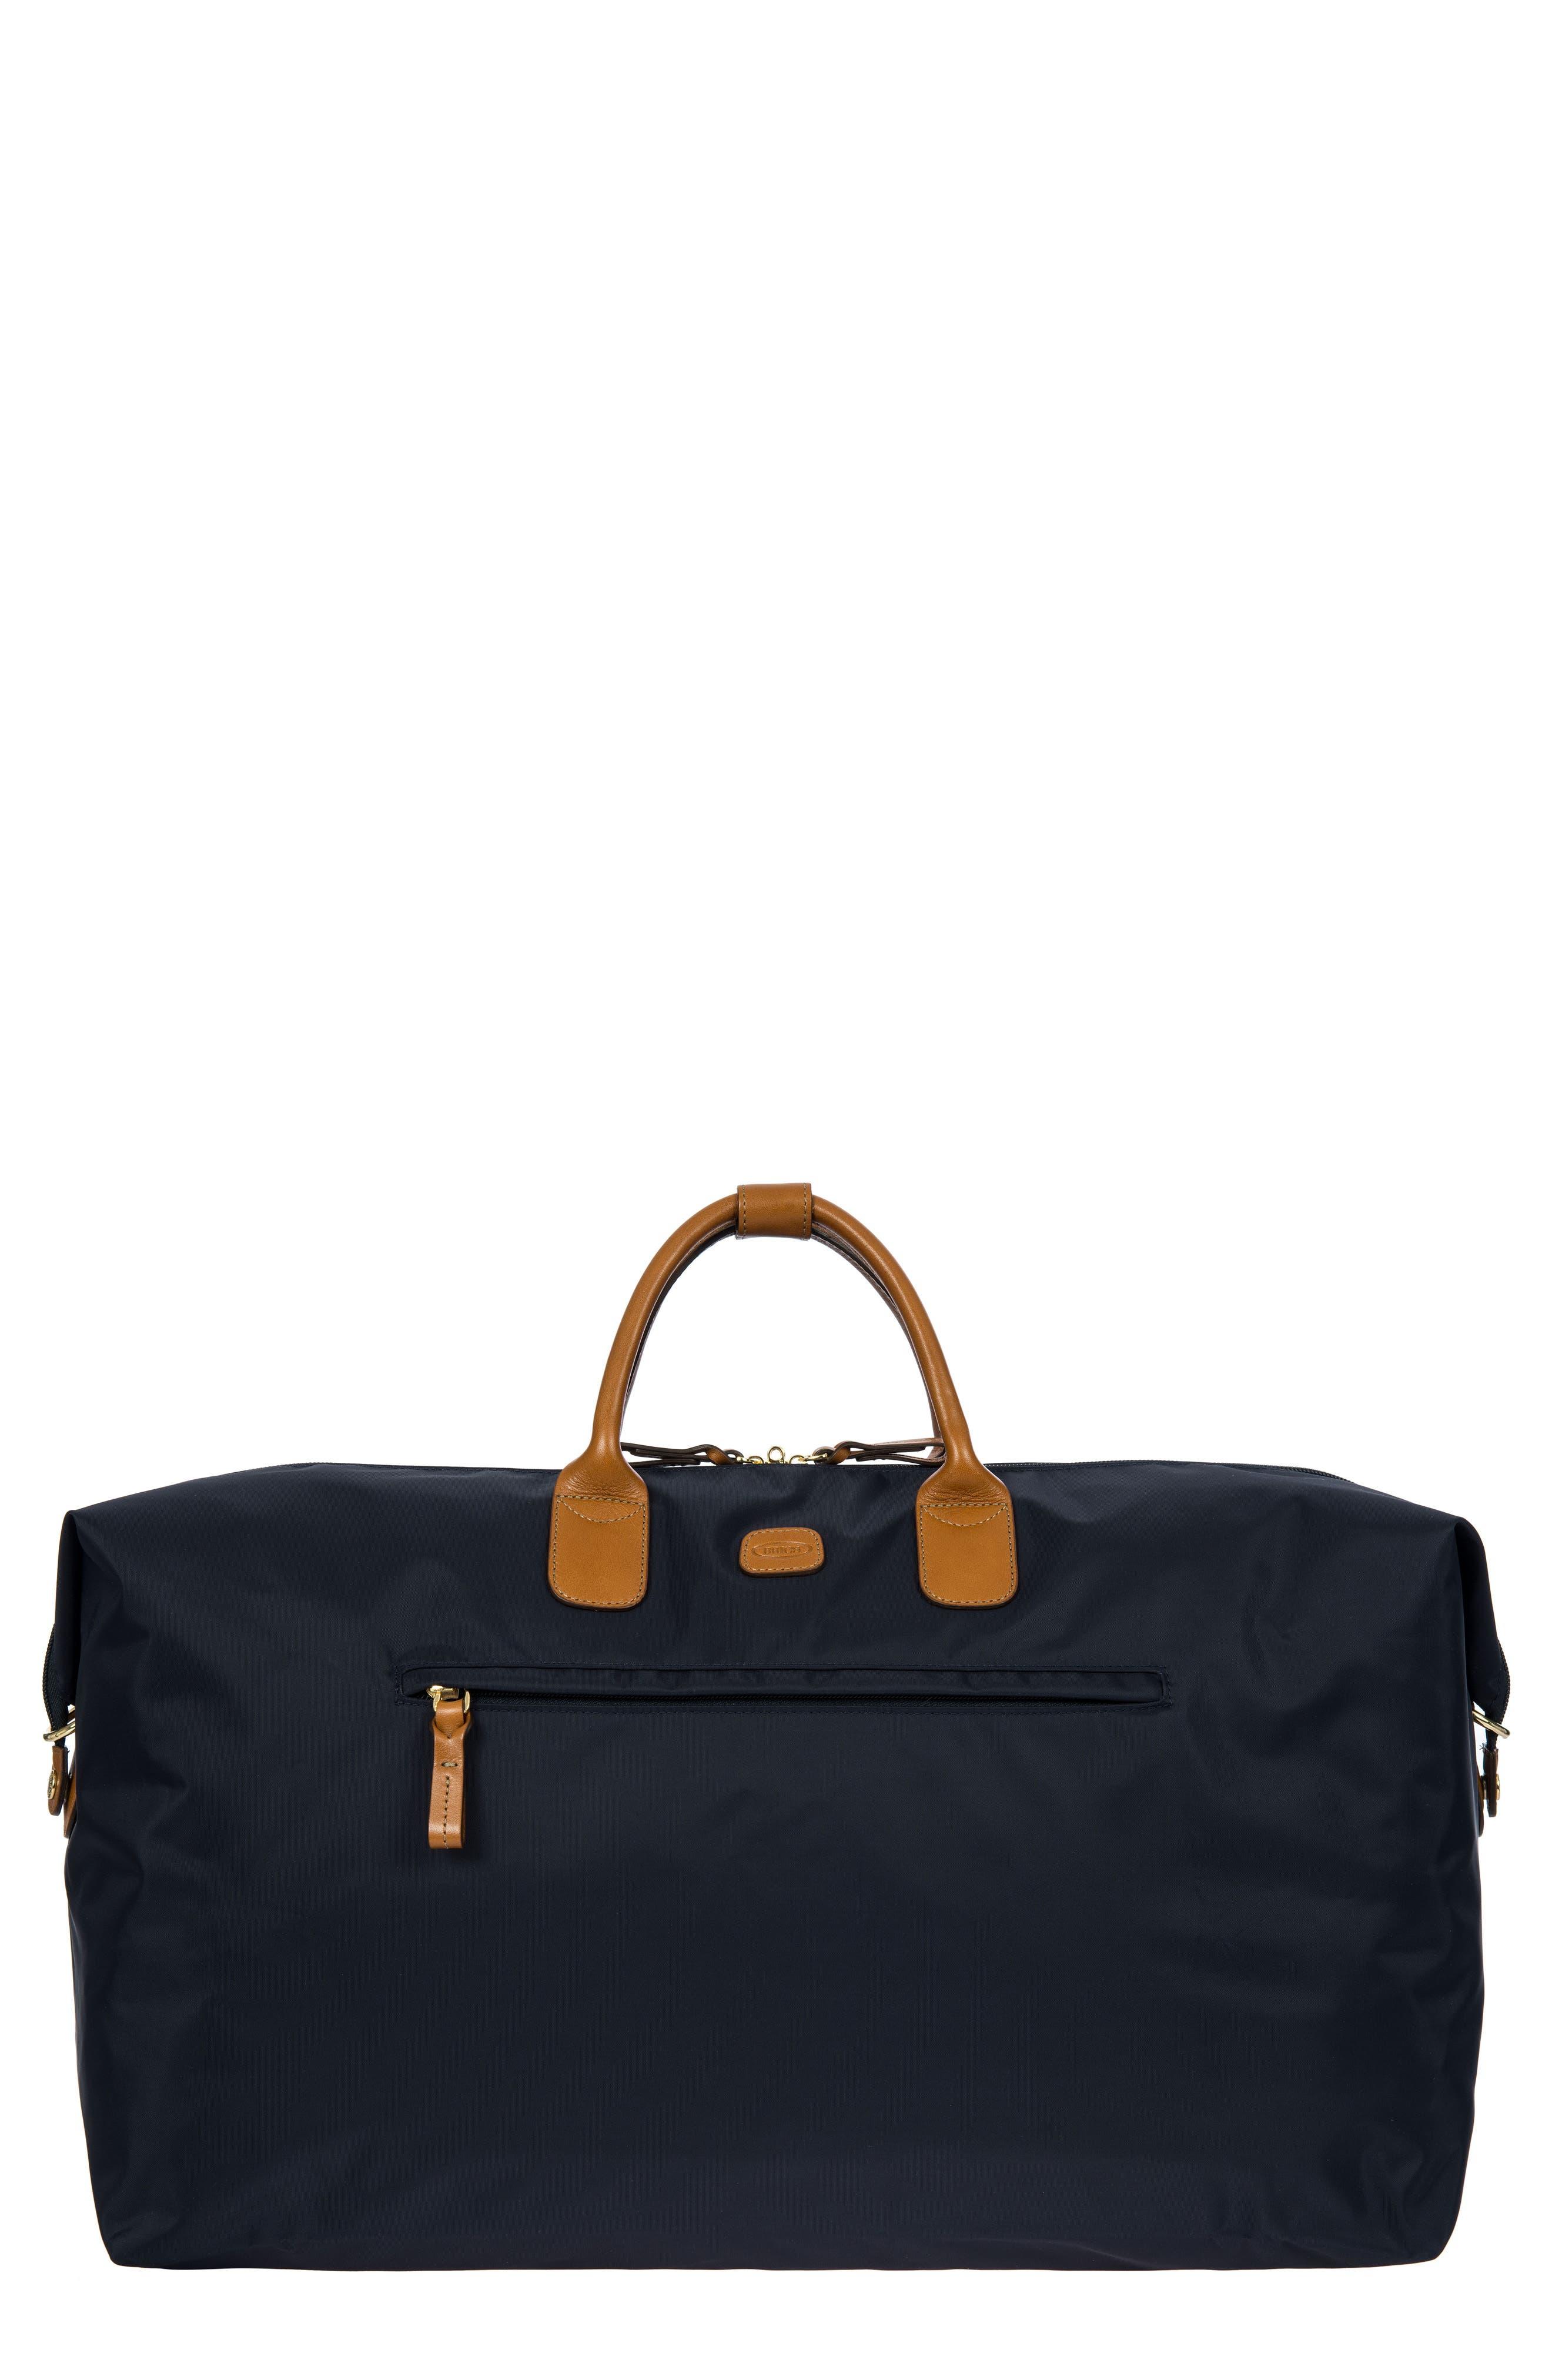 X-Bag Boarding 22-Inch Duffel Bag,                             Main thumbnail 1, color,                             NAVY